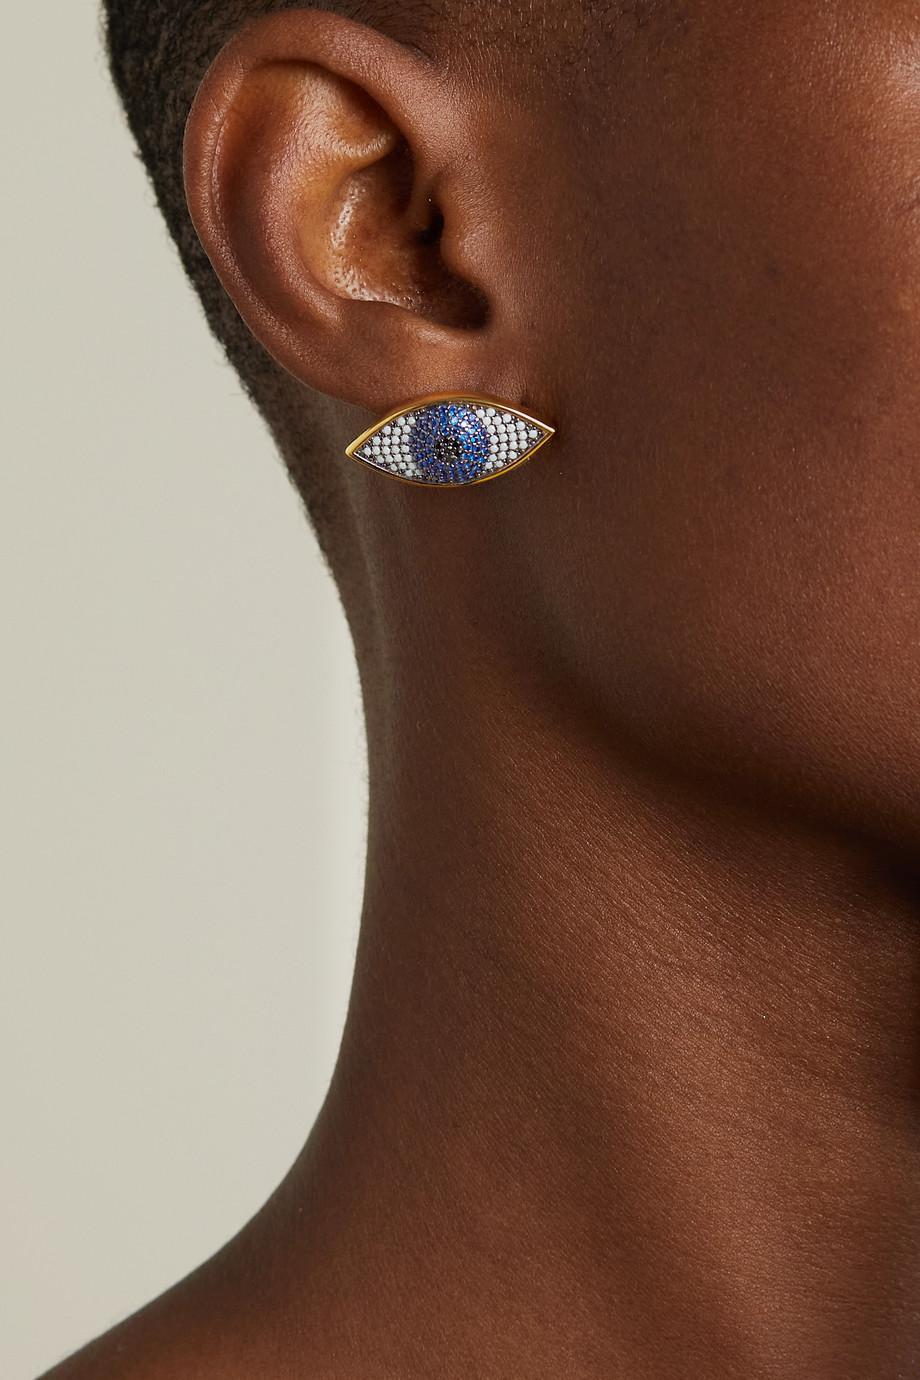 Begüm Khan Nazar mini gold-plated crystal earrings